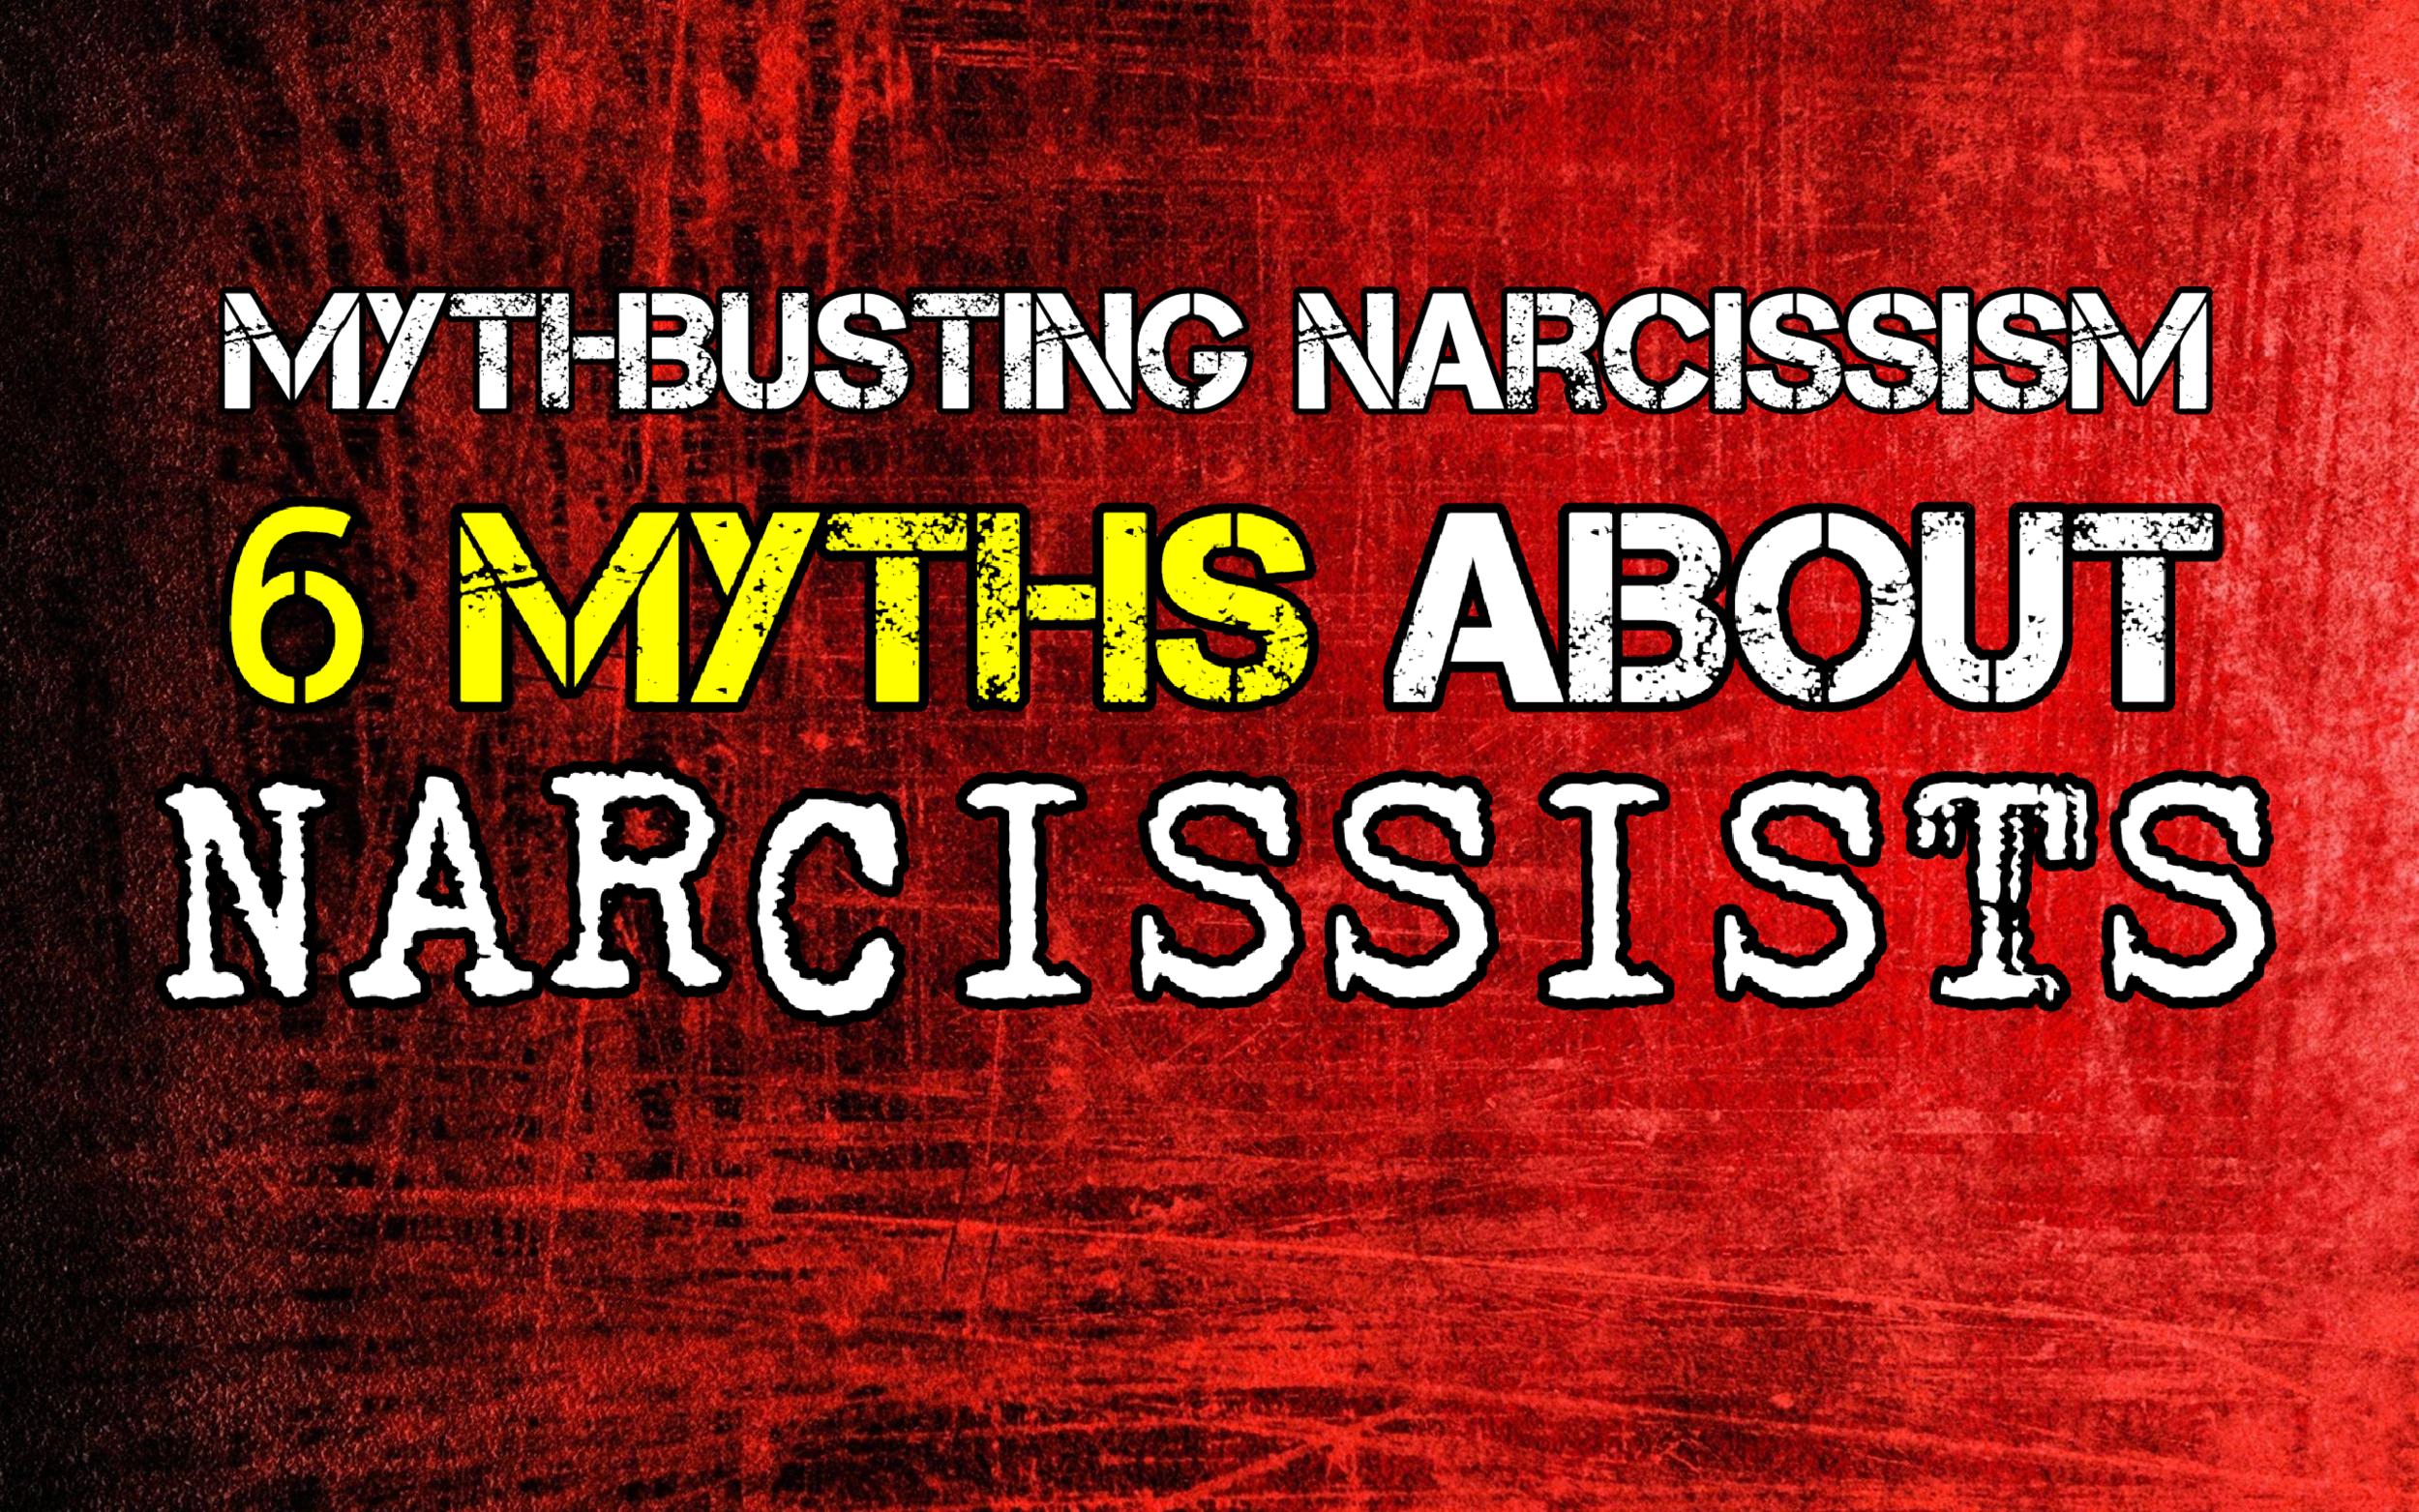 6 myths (1).png